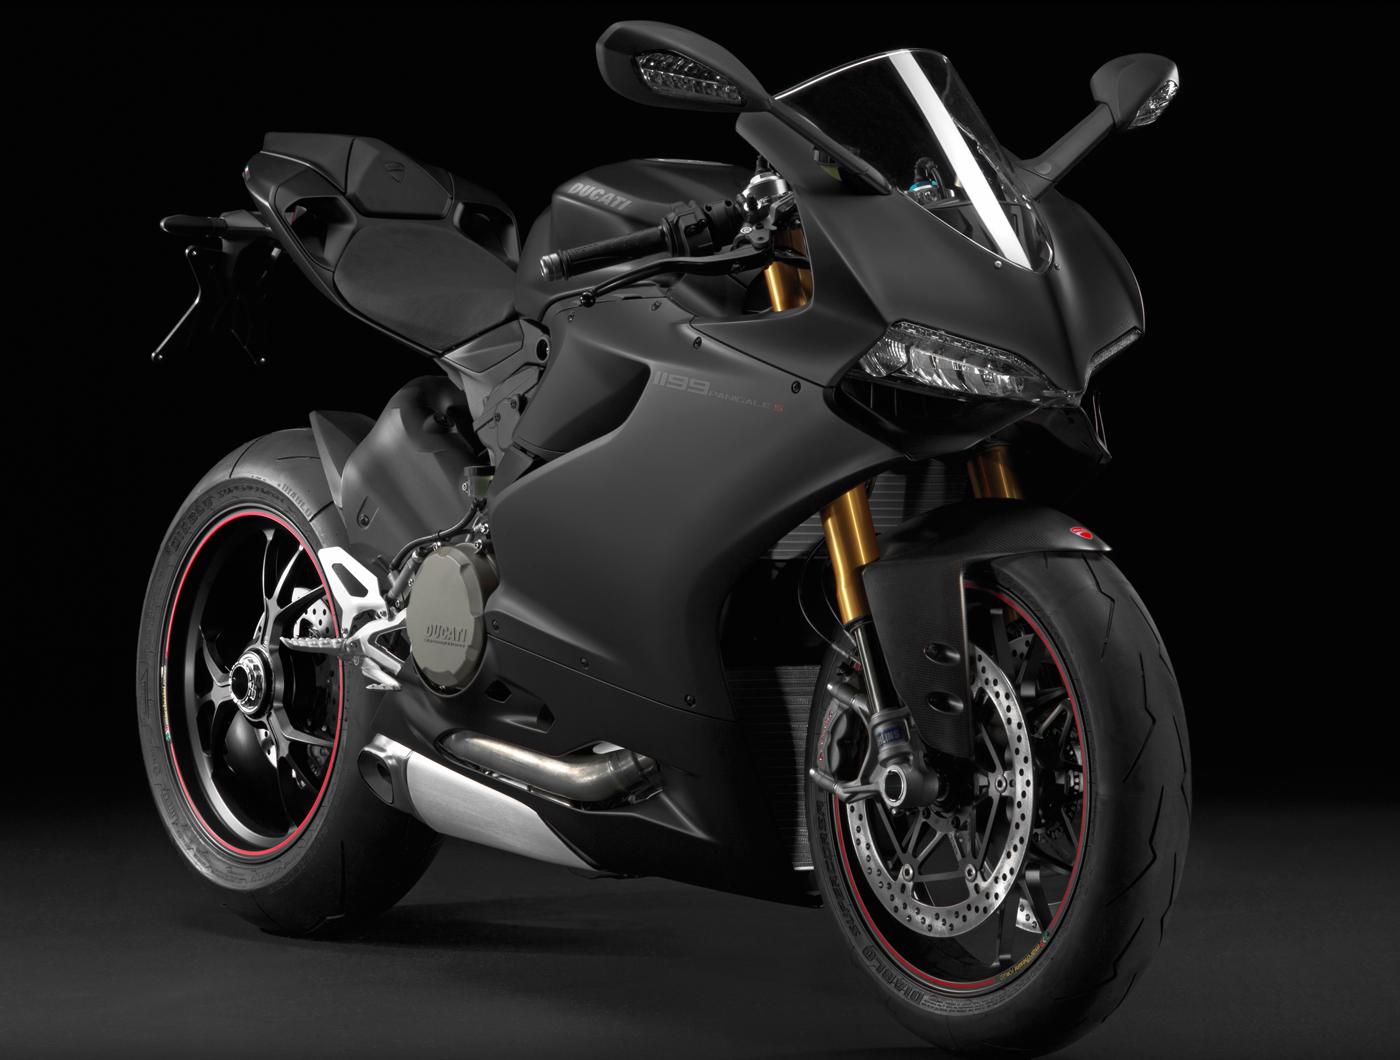 superbike - photo #48